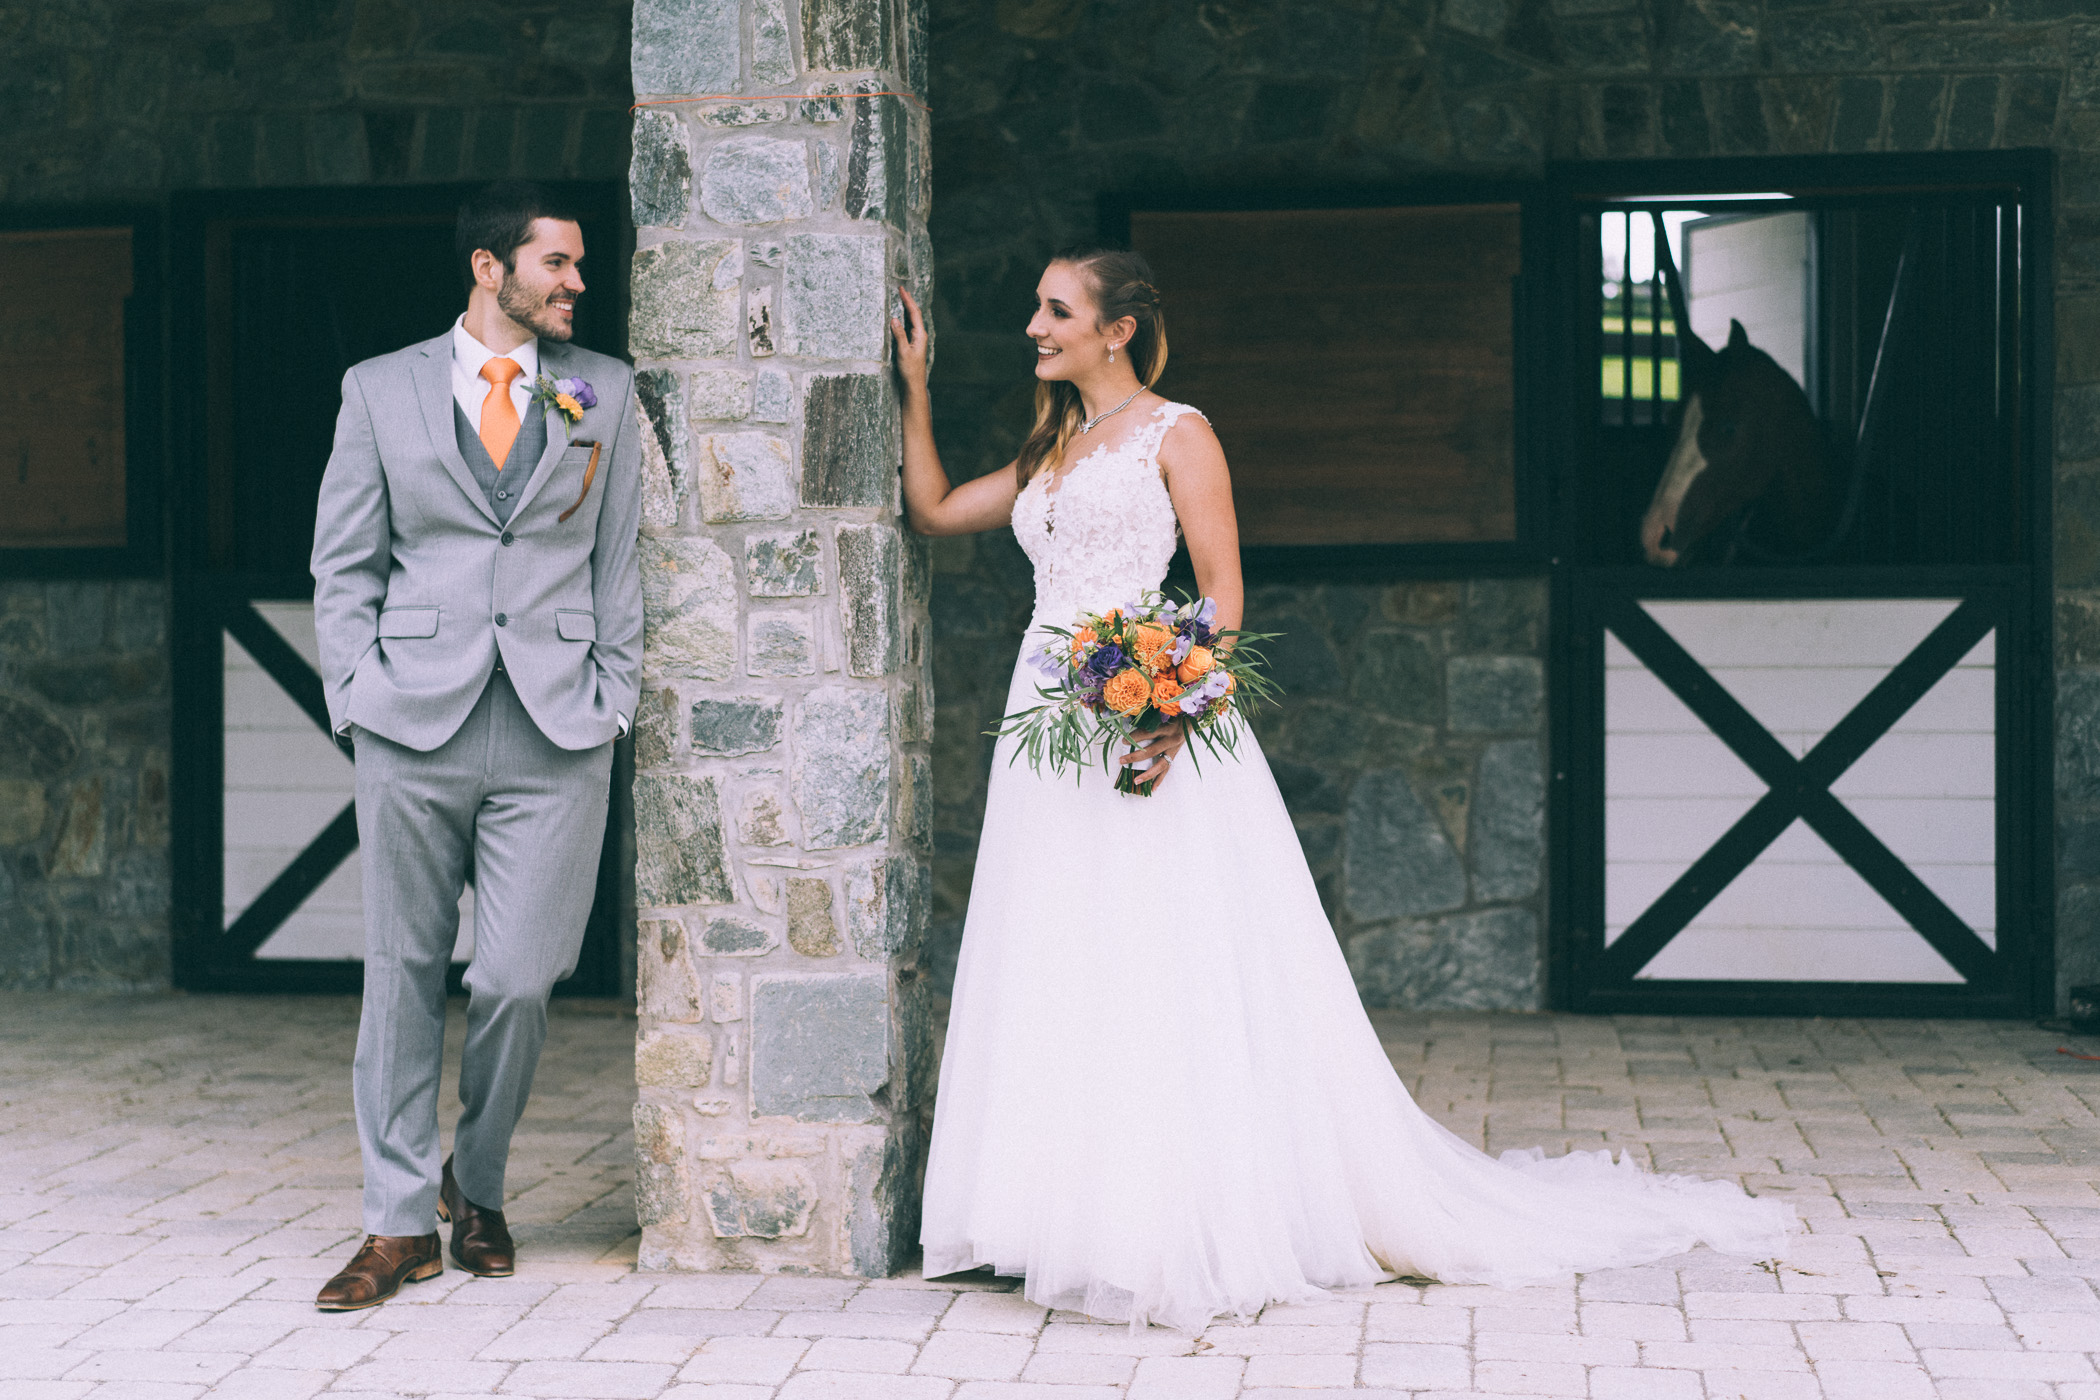 18-Faux Wedding-brandon shane warren-243.jpg